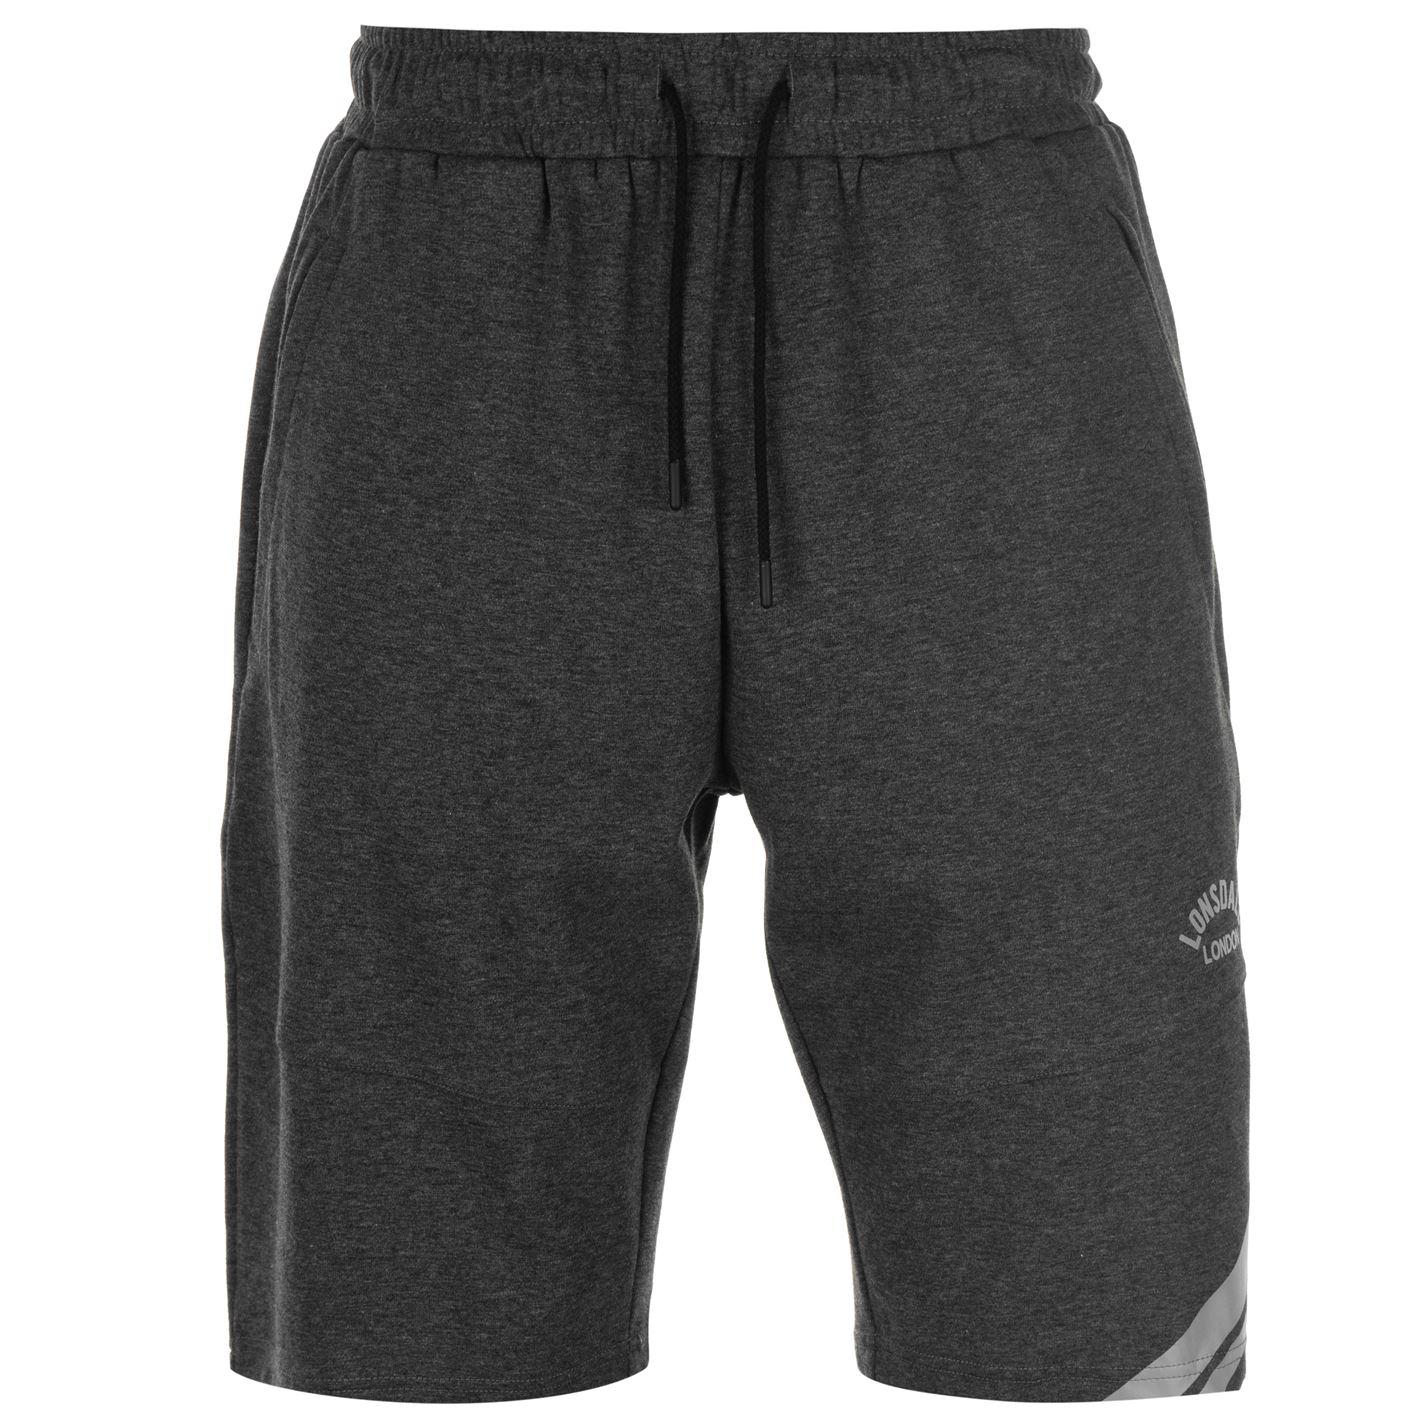 Lonsdale Fleece Shorts Mens